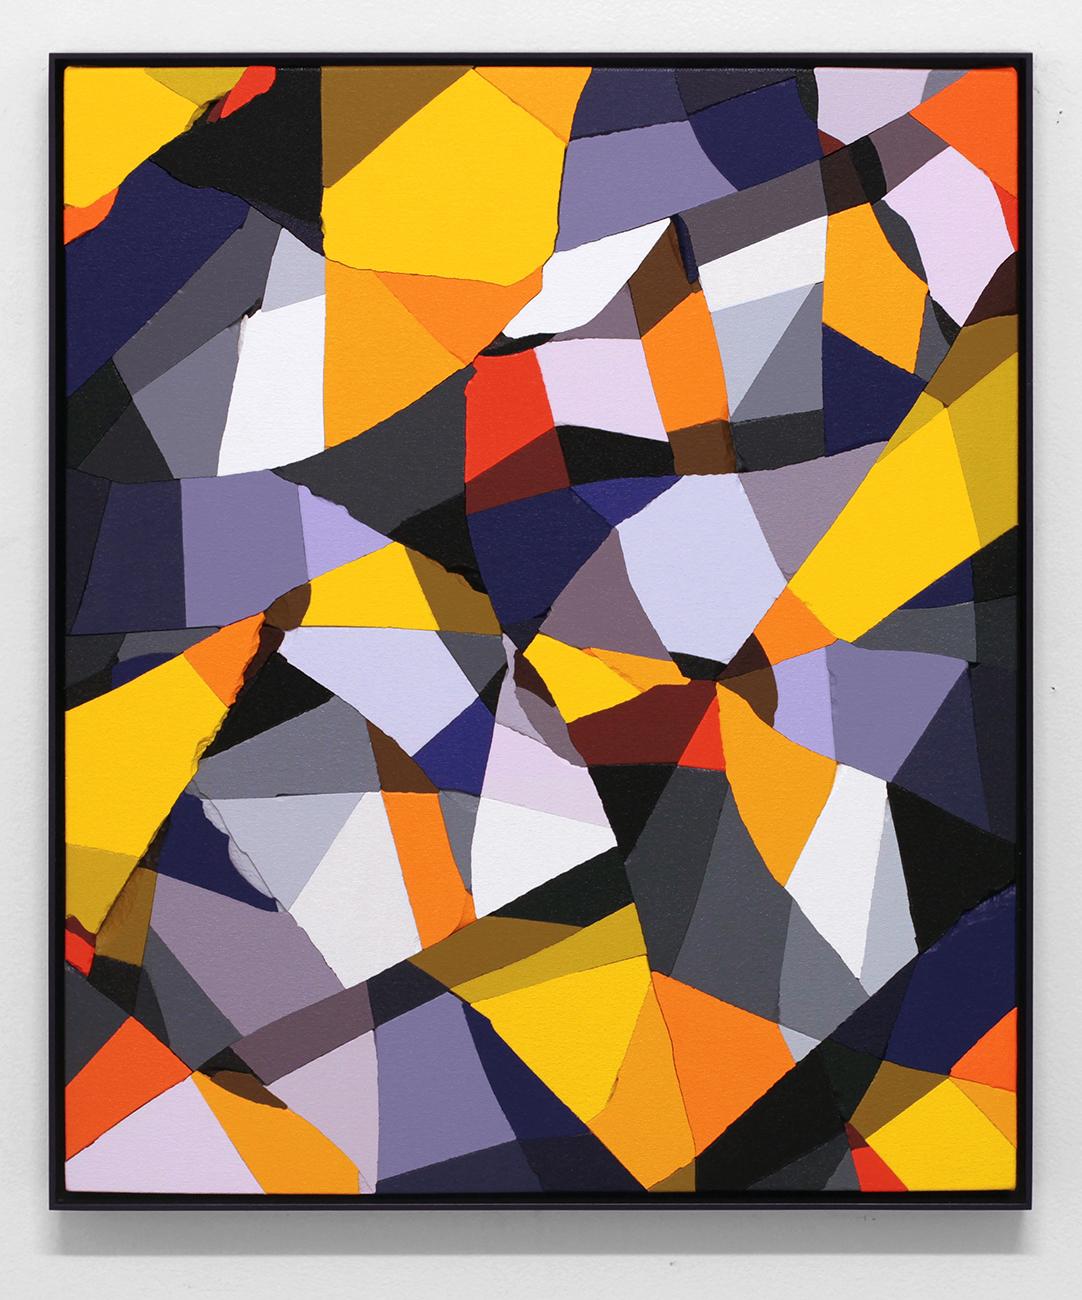 B.C. (Copernicus)   Acrylic on broken plaster  2017  22 x 18 inches  (55.88 x 45.72 cm)